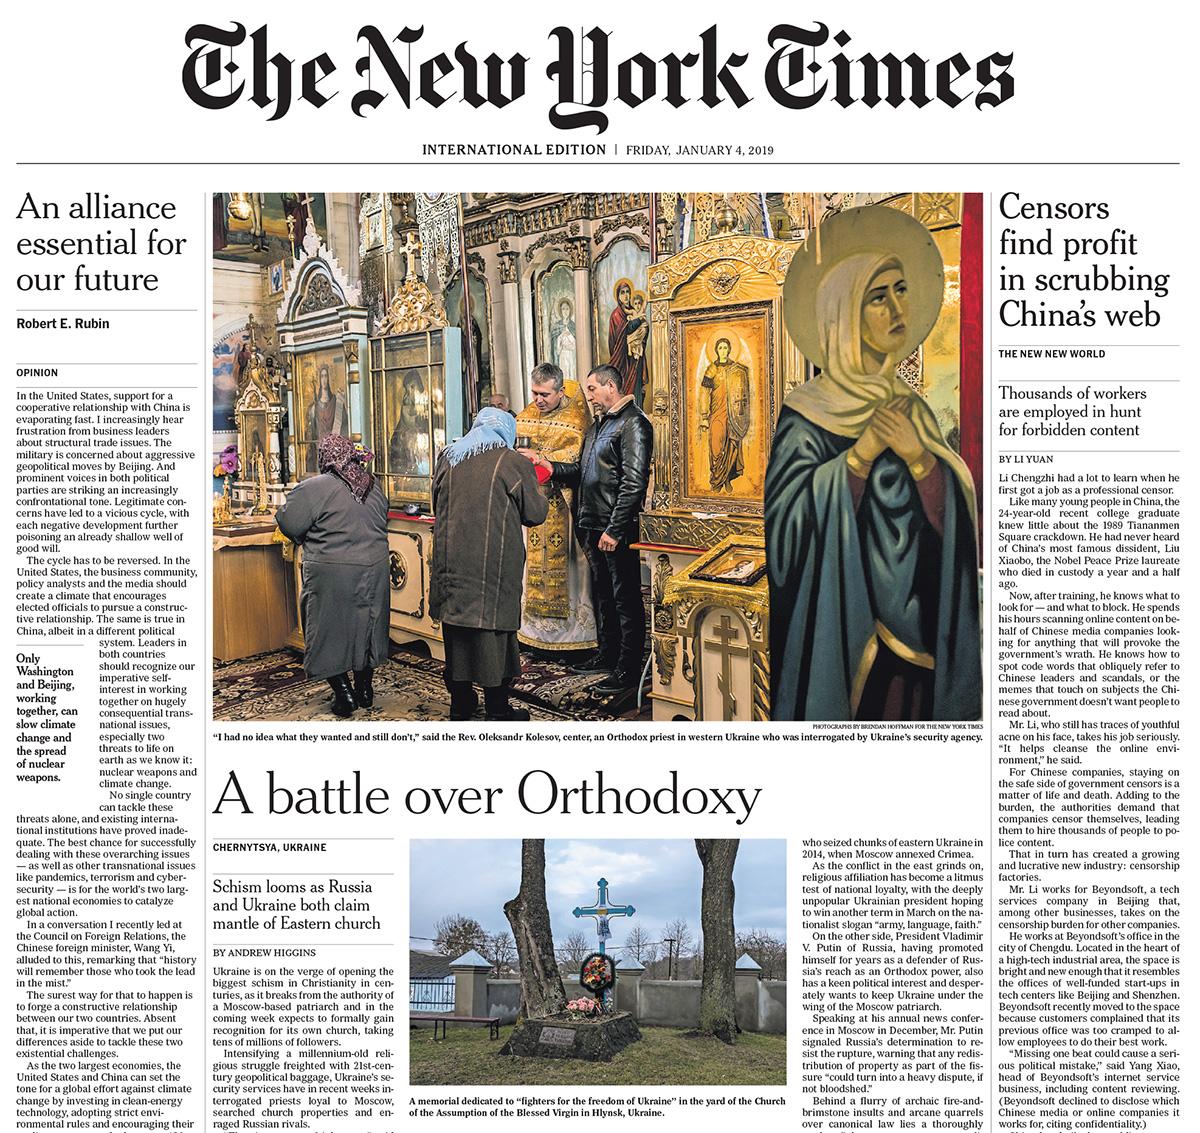 International New York Times, 4 January 2019